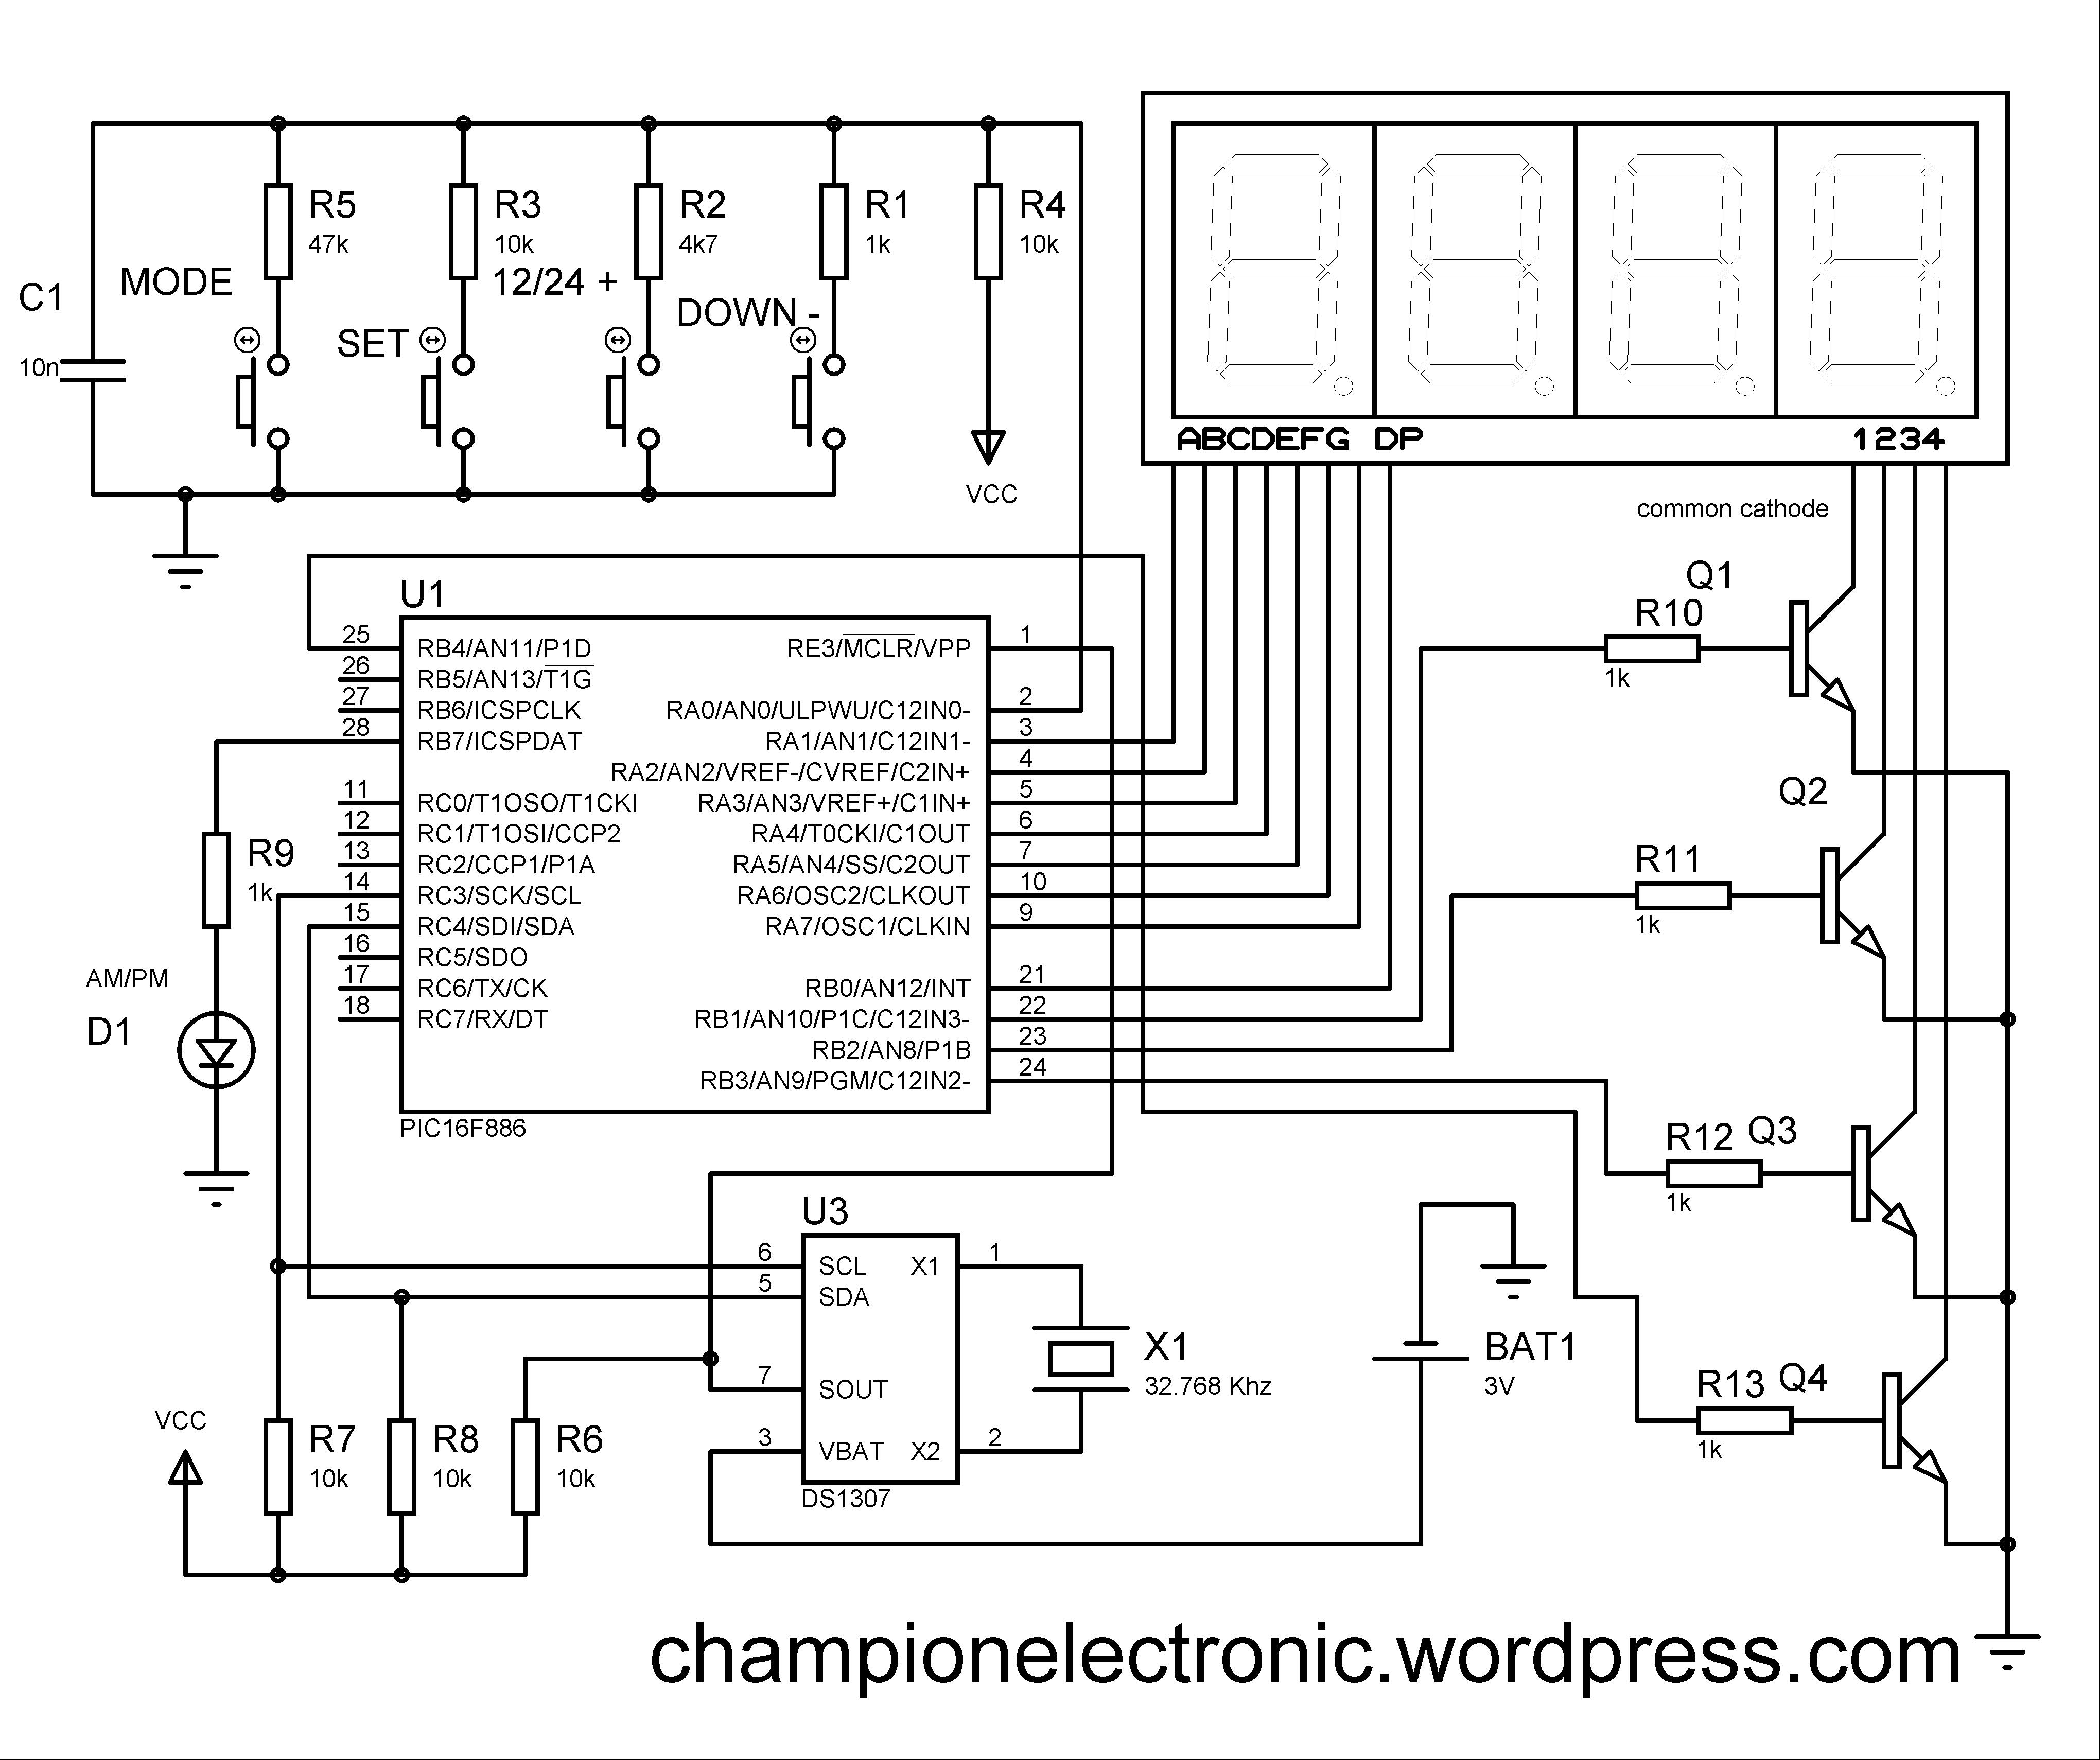 championelectronic